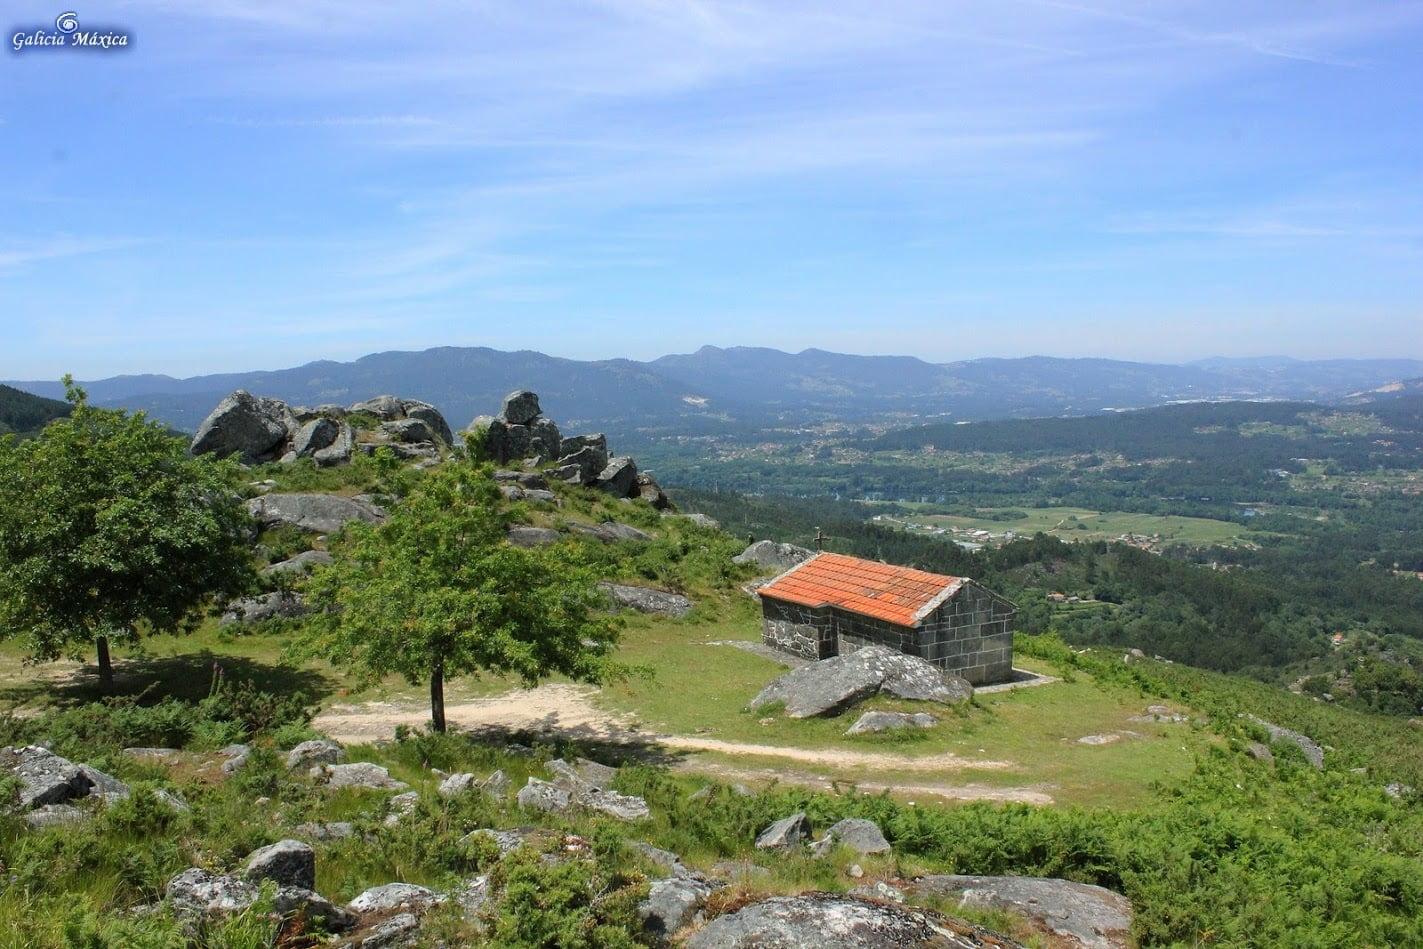 Al fondo Galicia